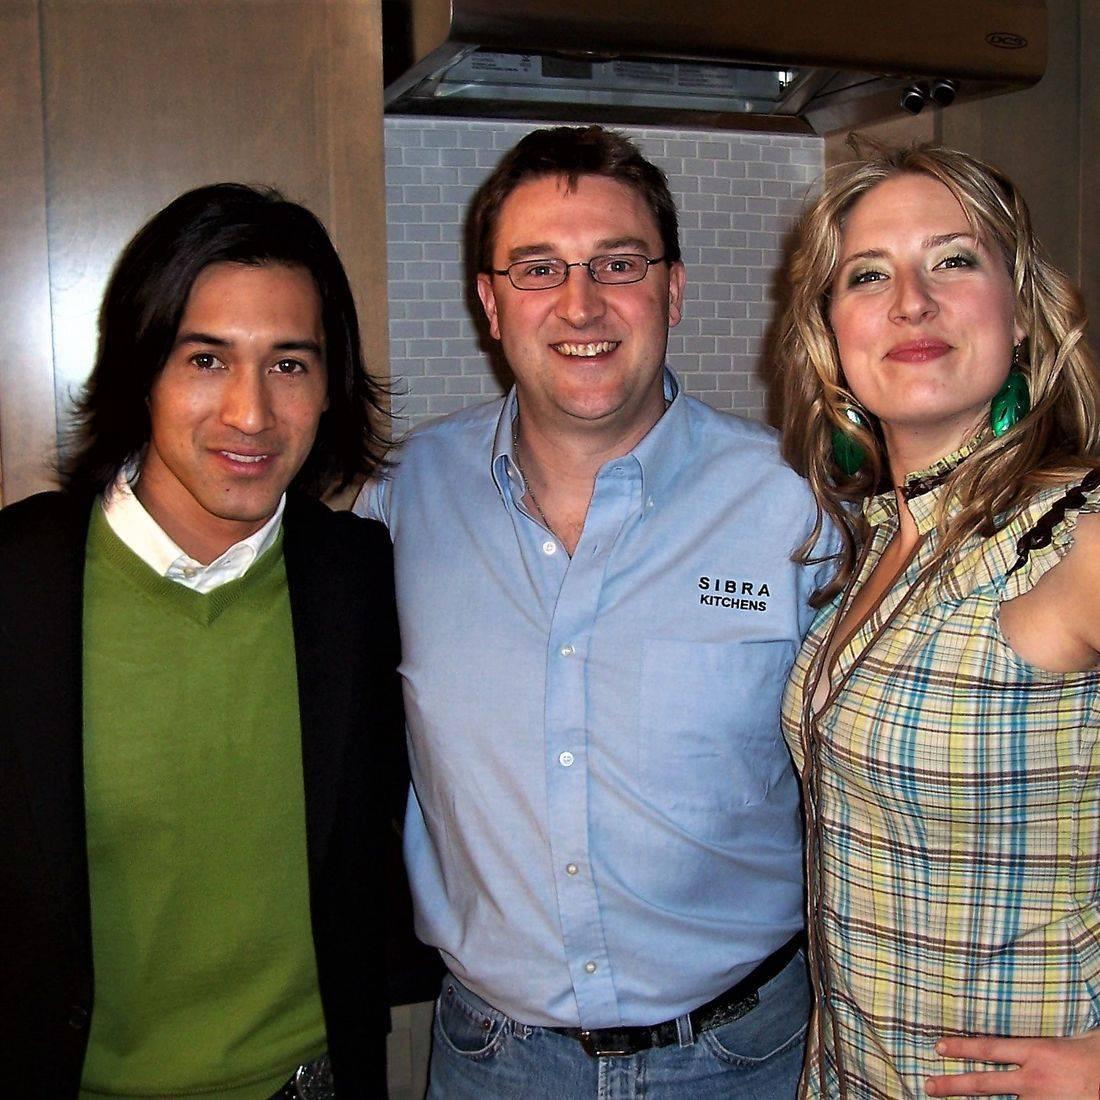 Derek Krauss Emmanuel Belliveau Andrika Lawren Sibra Kitchens Markham Toronto cabinets HGTV